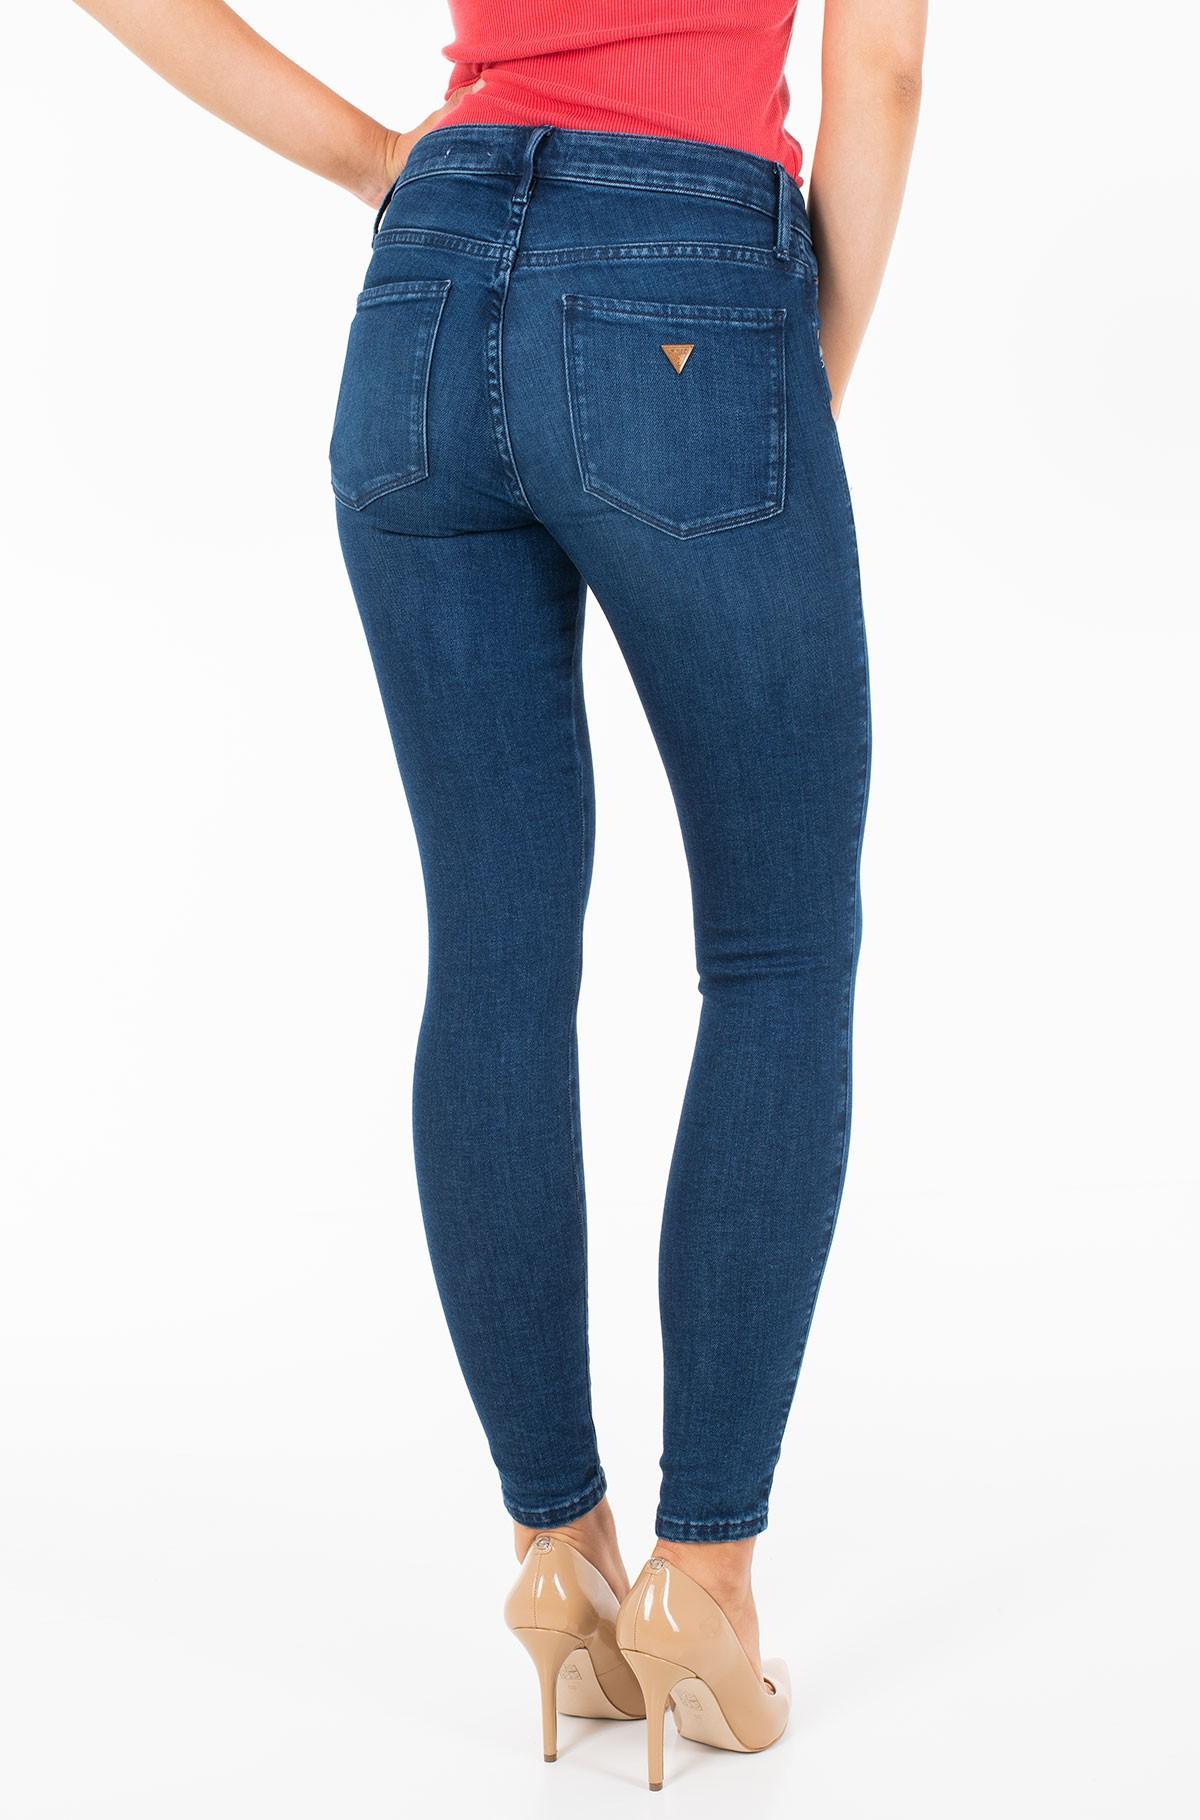 Jeans WB9AJ3 D3NQ0-full-2